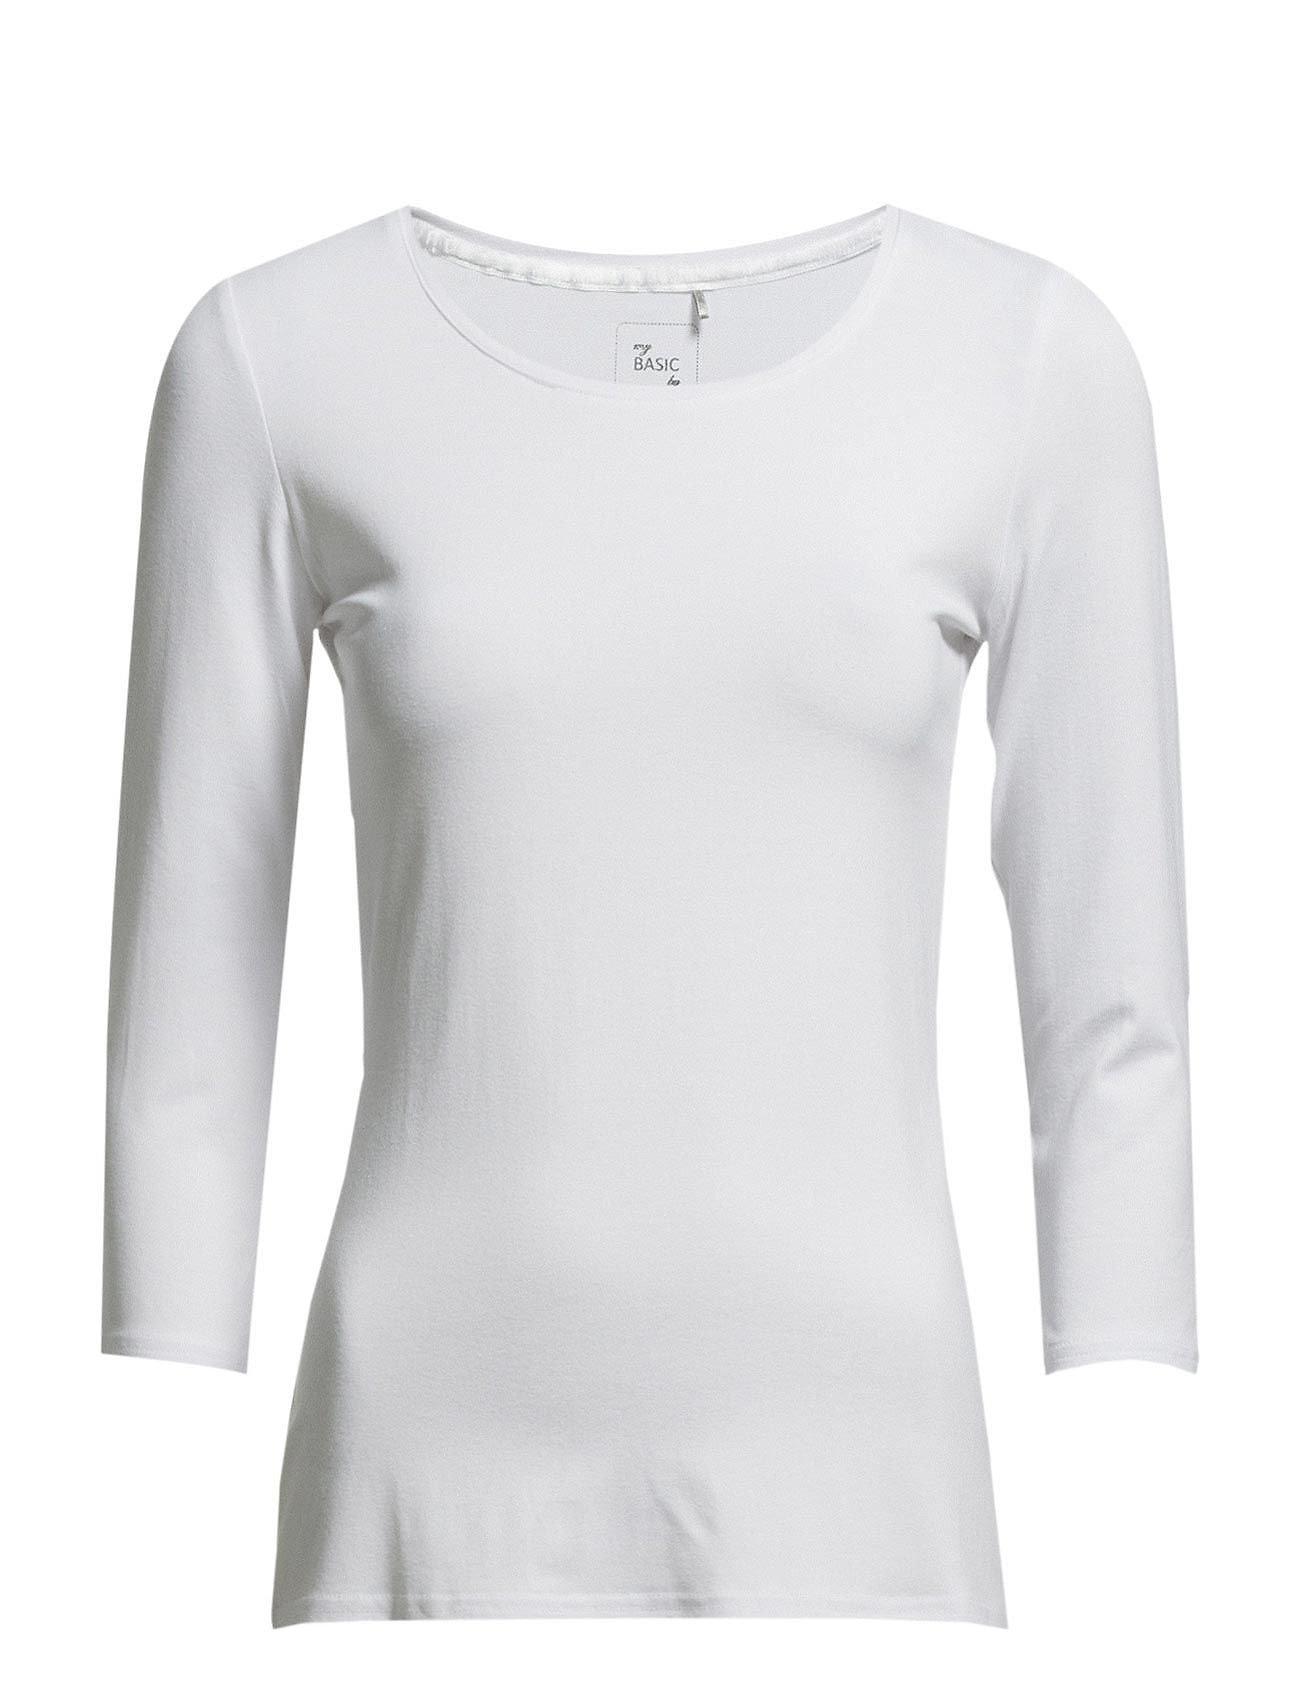 Fransa Kikse Tshirt - WHITE